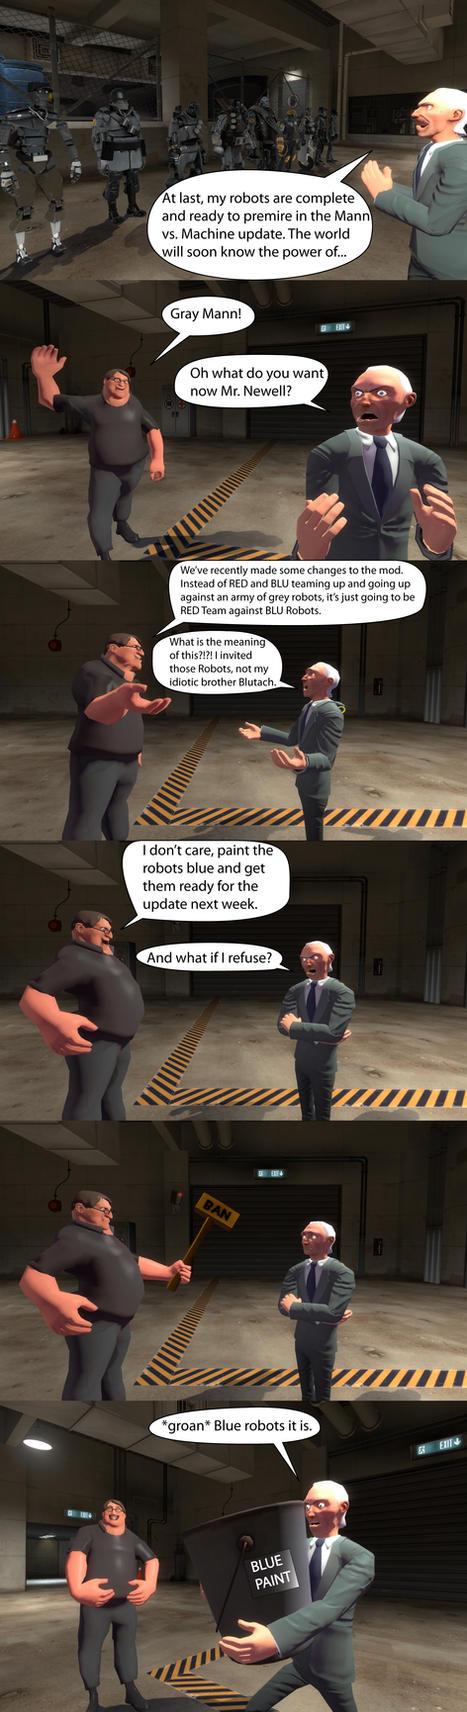 Mann vs. Machine: Last Minute Changes by MeltingMan234